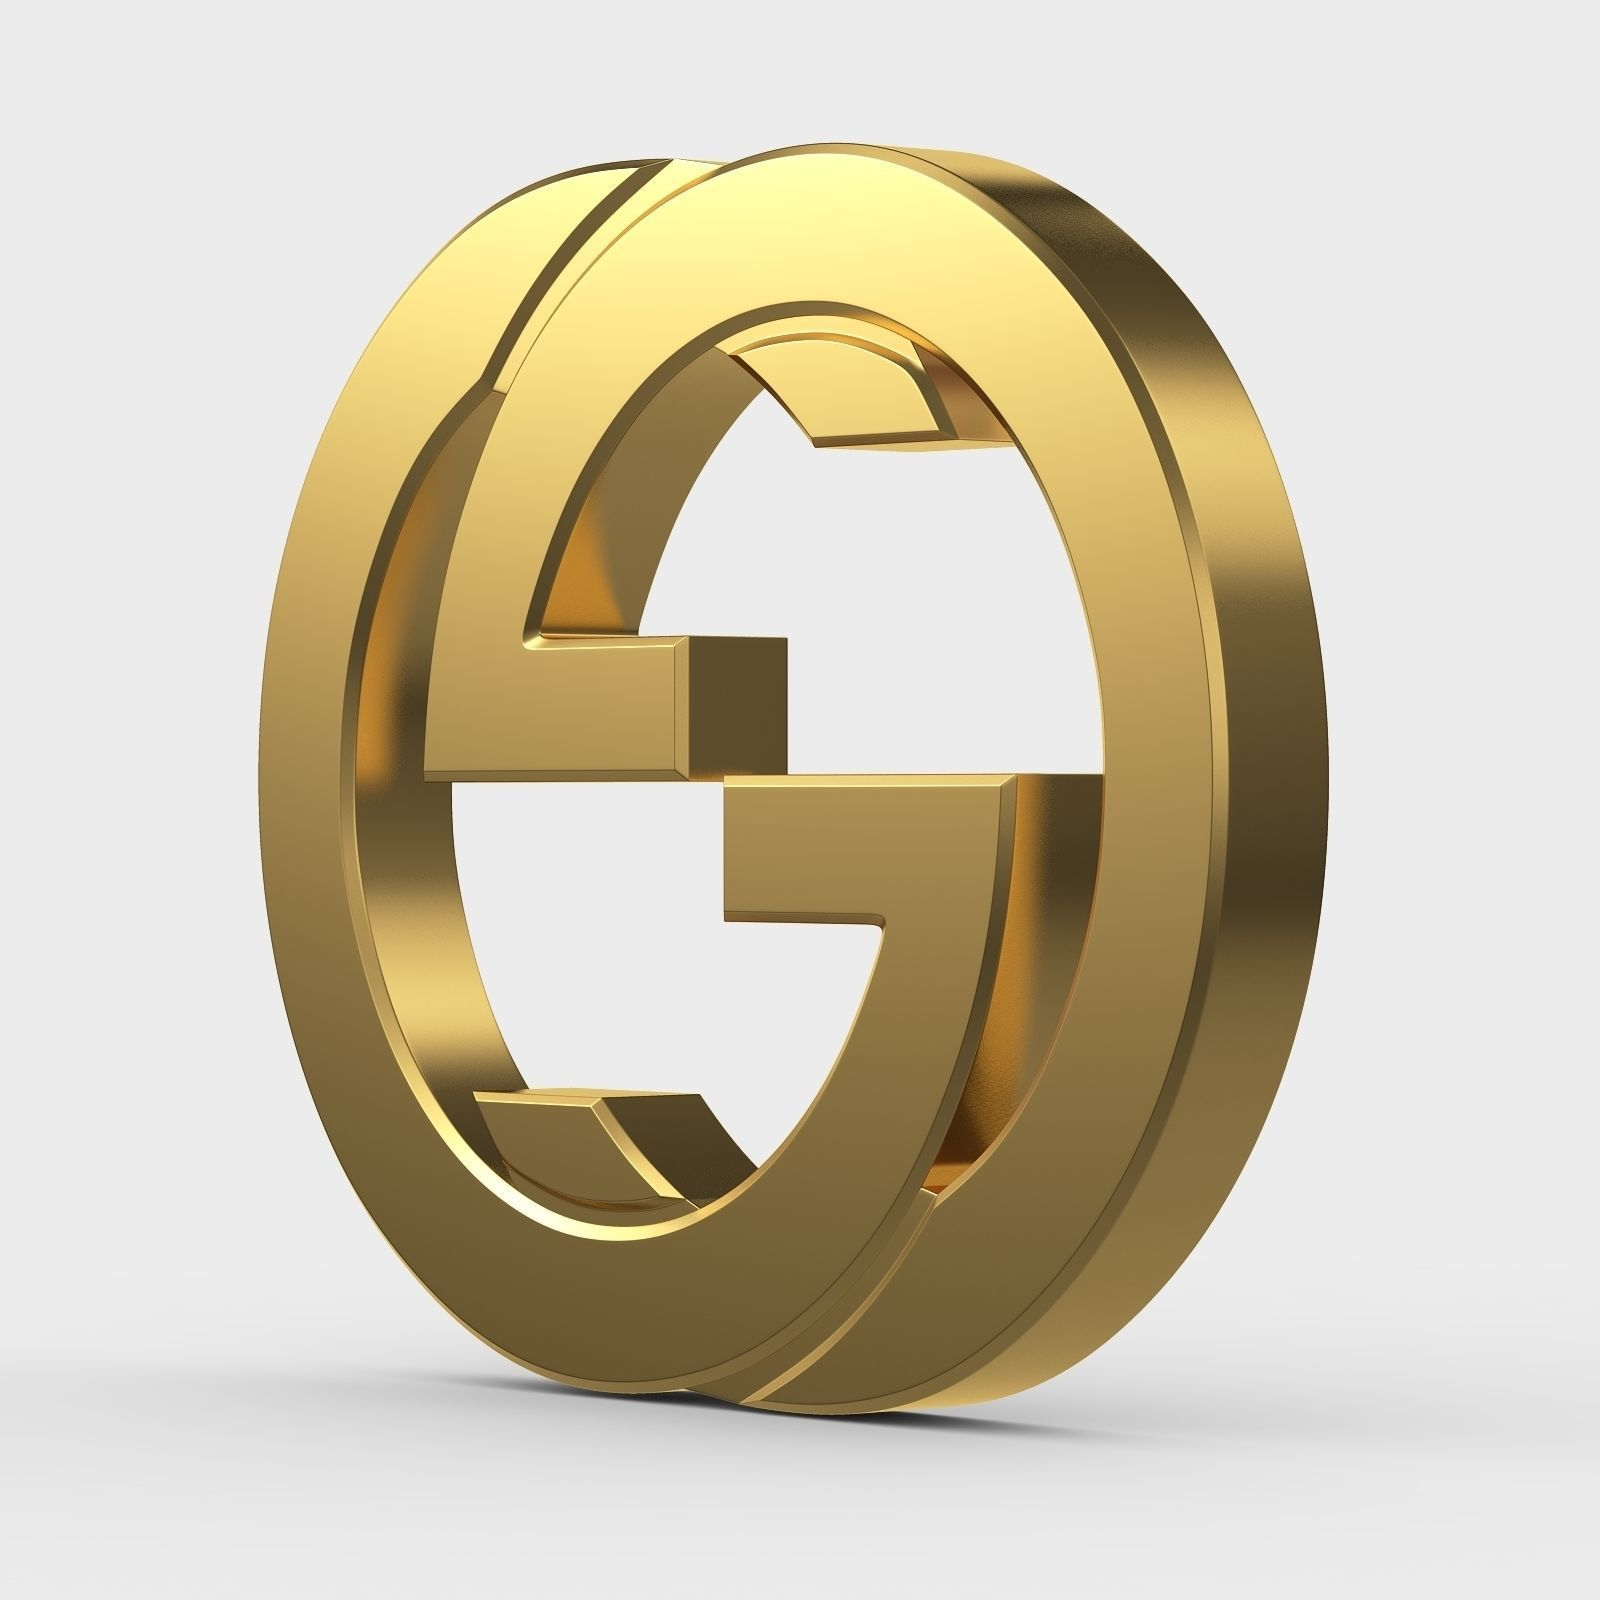 Business Logo Design And Redesign For You and 3 Unique Busines Logo Design